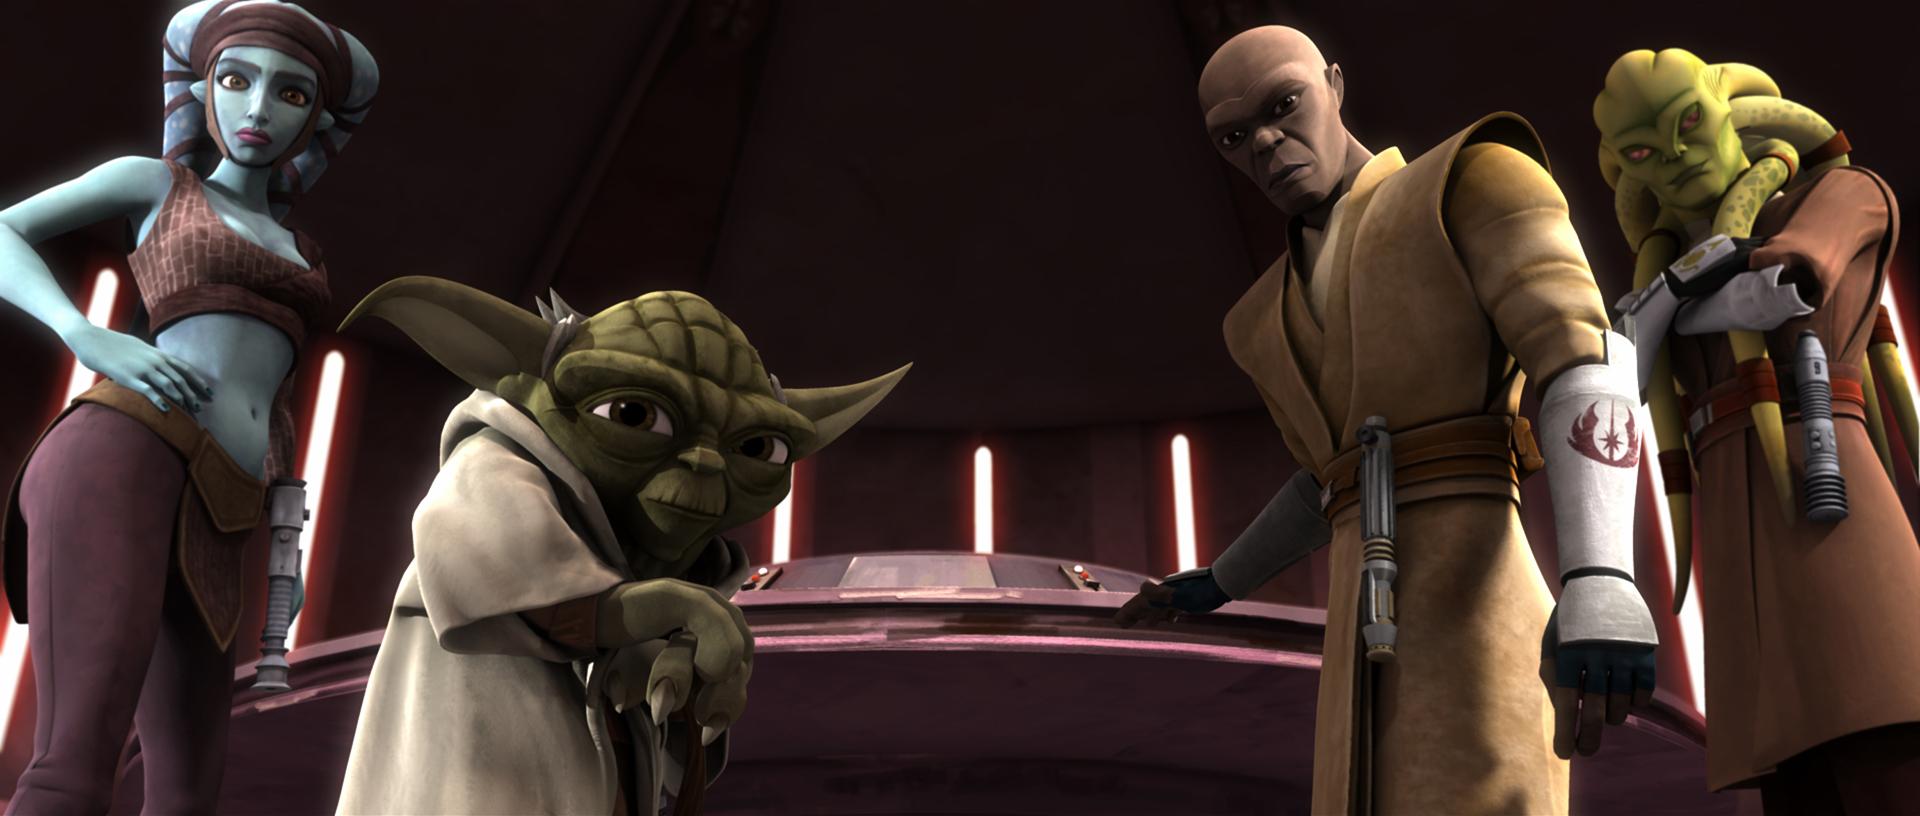 Blue eyed Jedi ? - Star Wars: Force and Destiny RPG - FFG